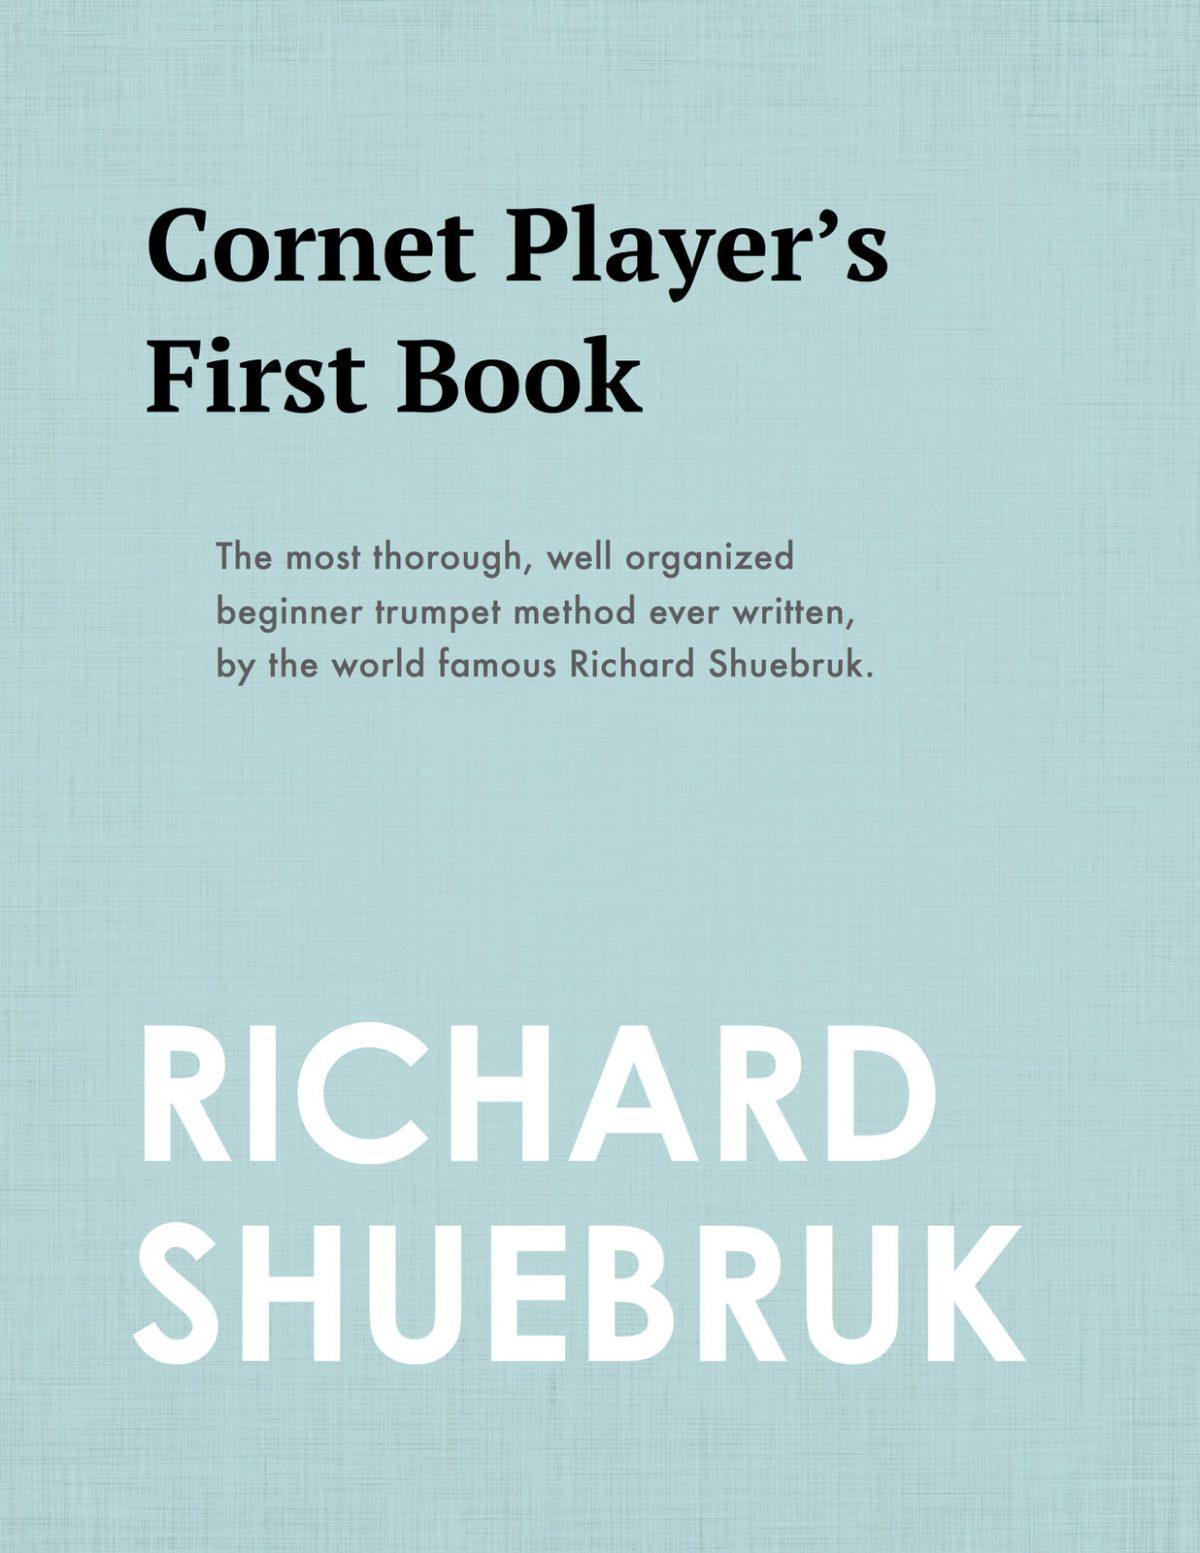 Shuebruk, The Cornet Player's First Book-p01